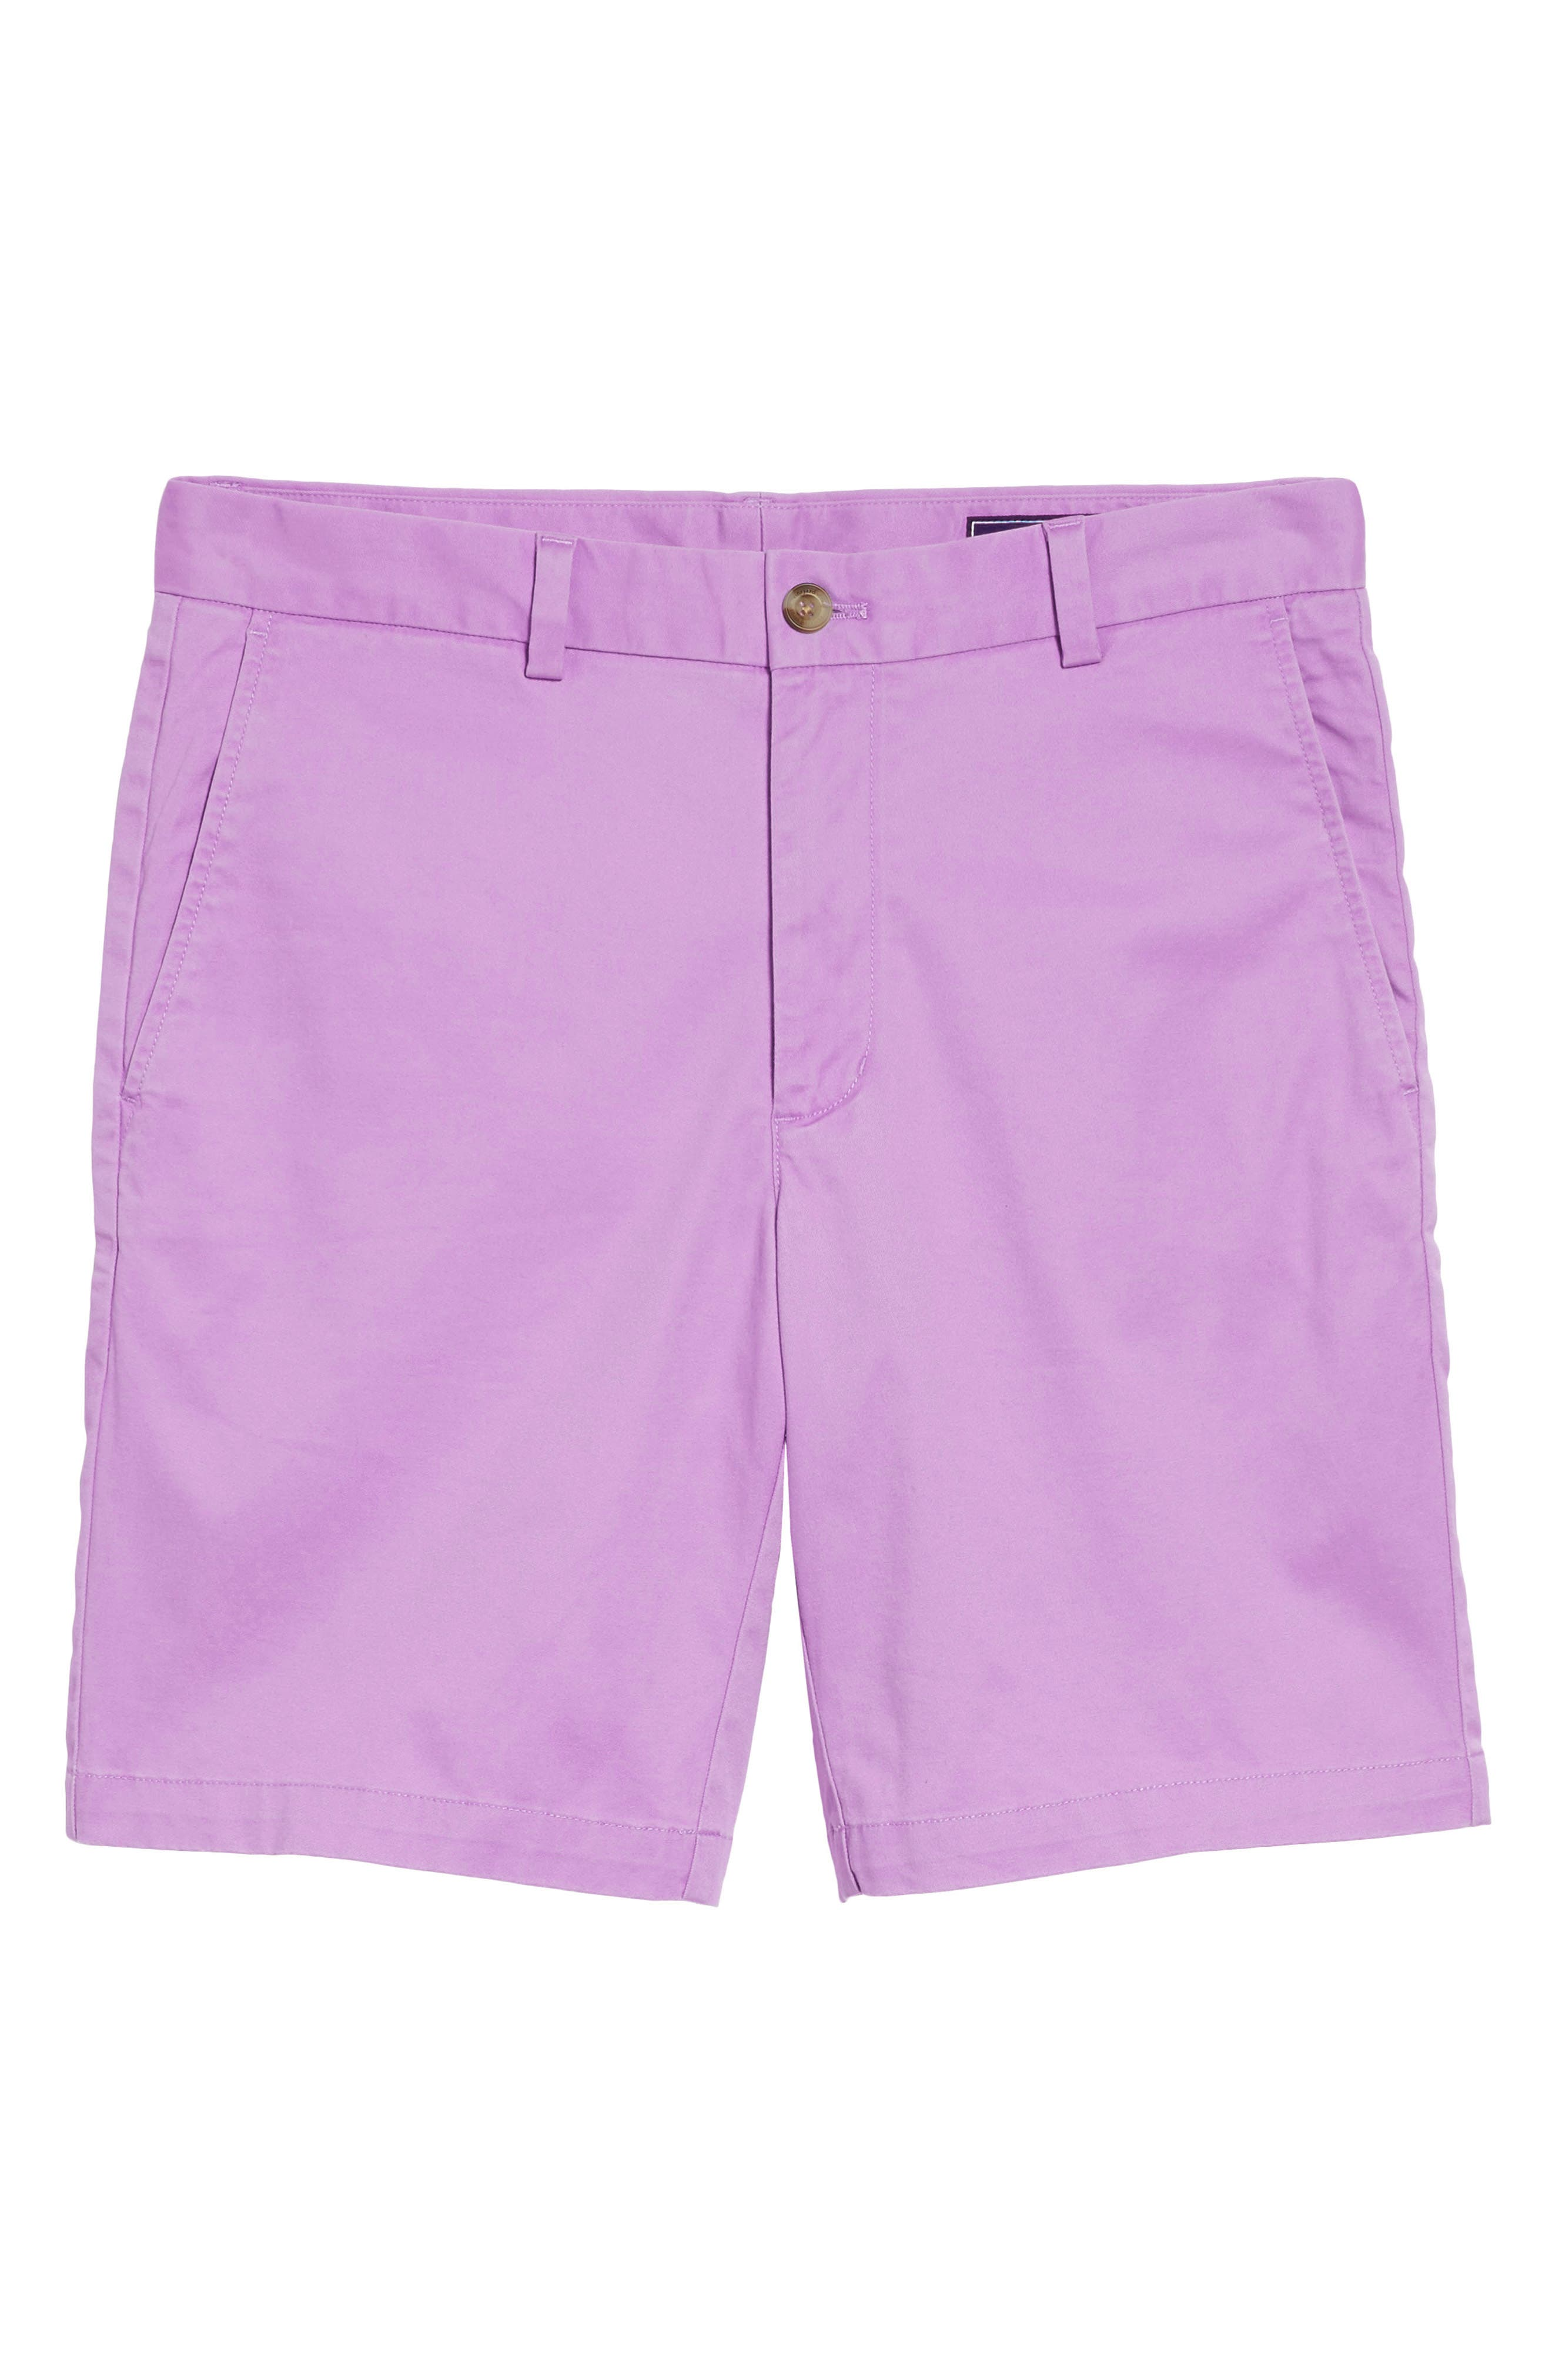 9 Inch Stretch Breaker Shorts,                             Alternate thumbnail 119, color,